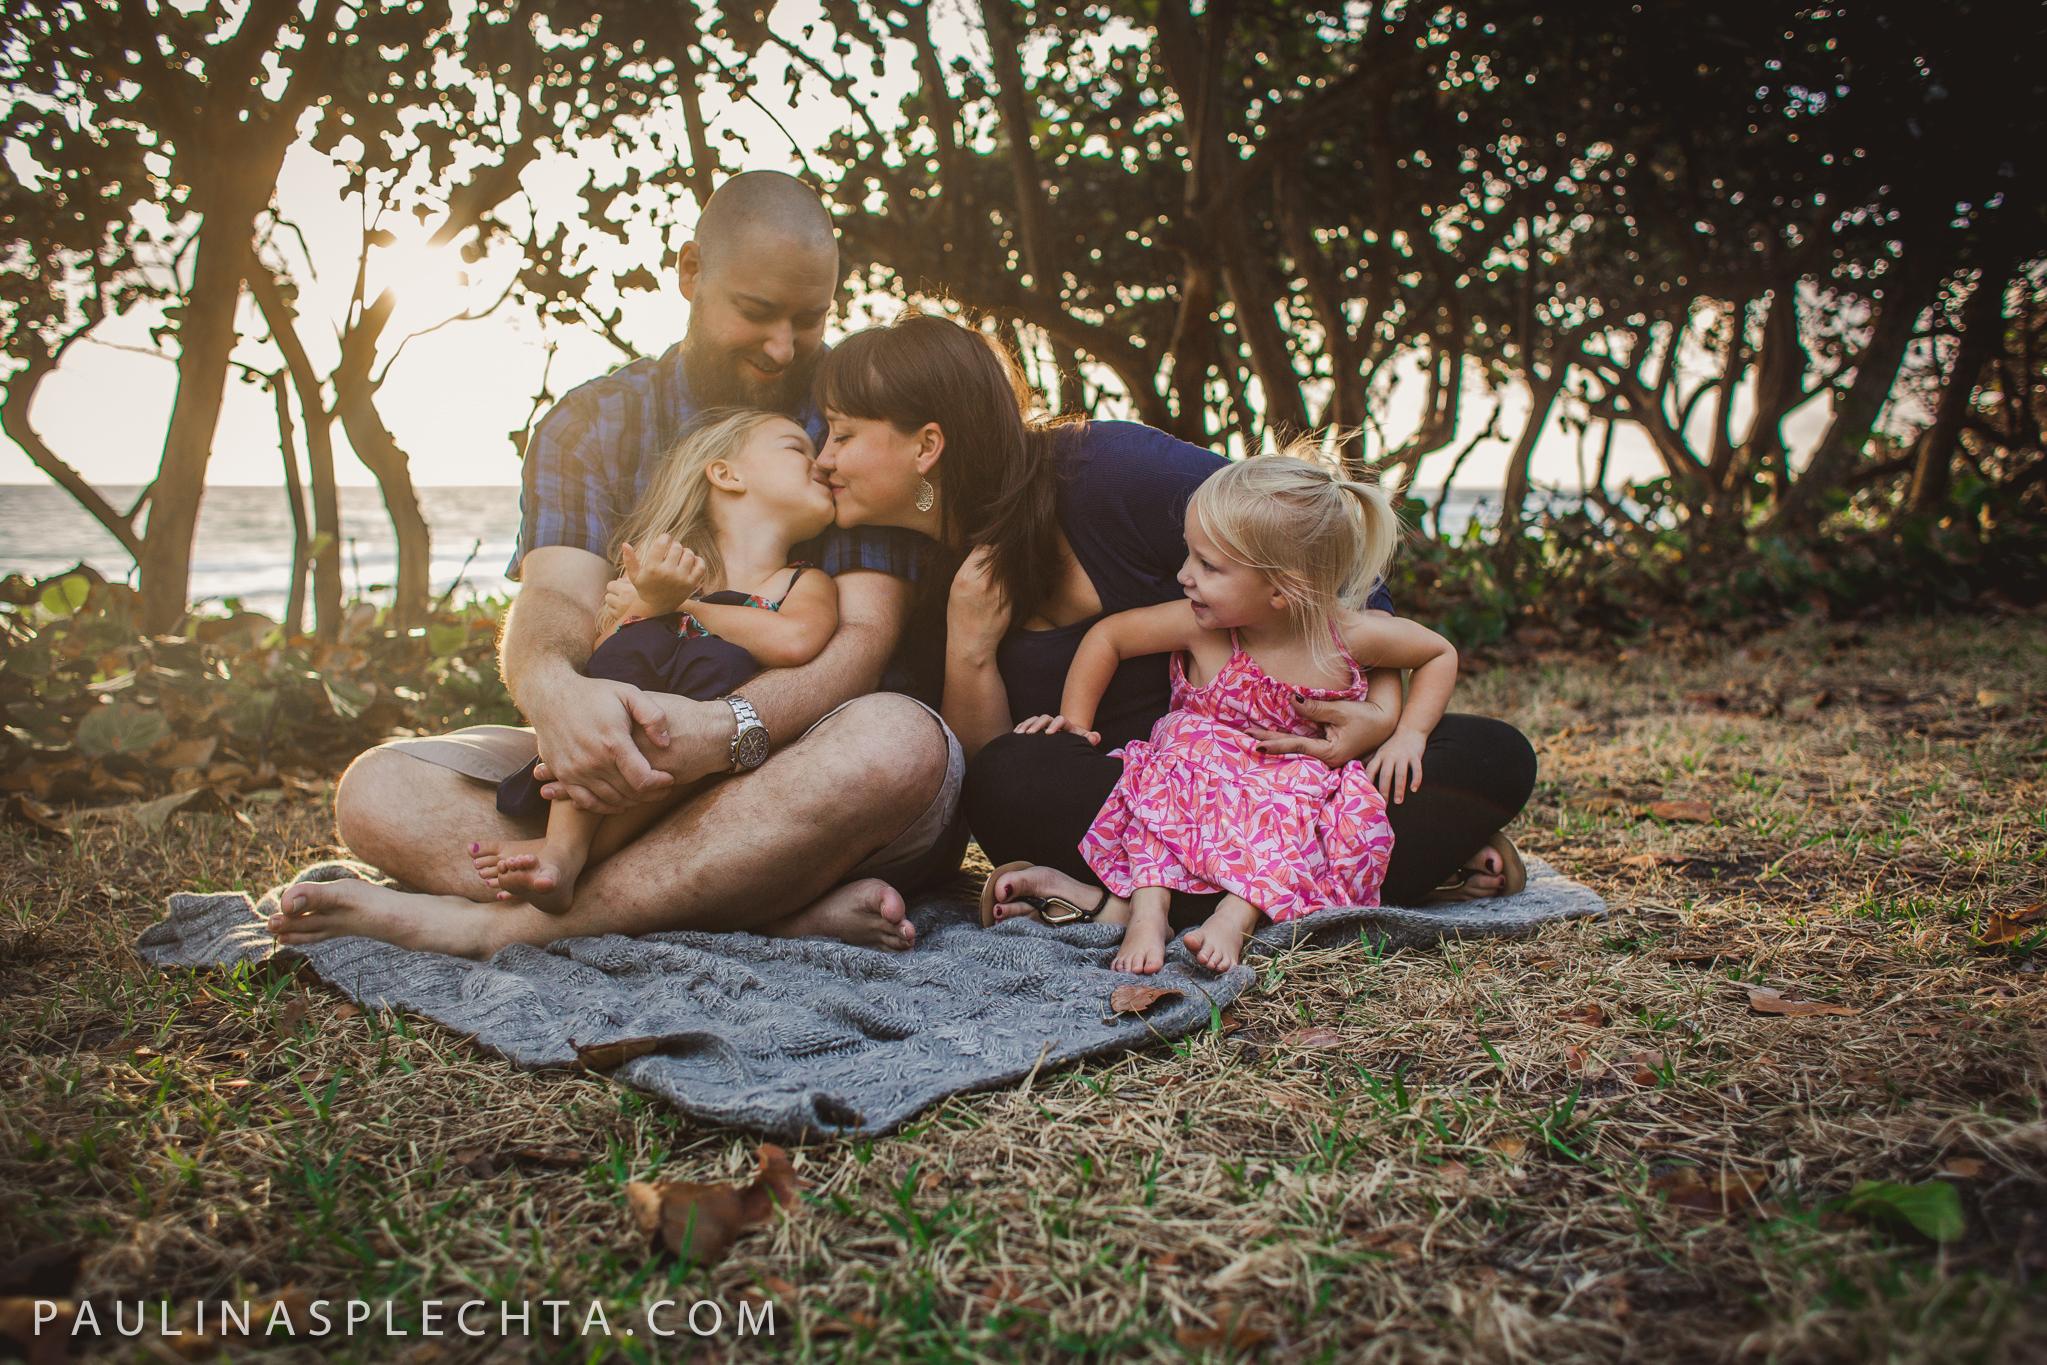 Family Photographer South Florida Pompano Broward Palm Beach Babies Baby Newborn Breastfeeding Birth Photograpy Beach Home Documentary Session-86.jpg